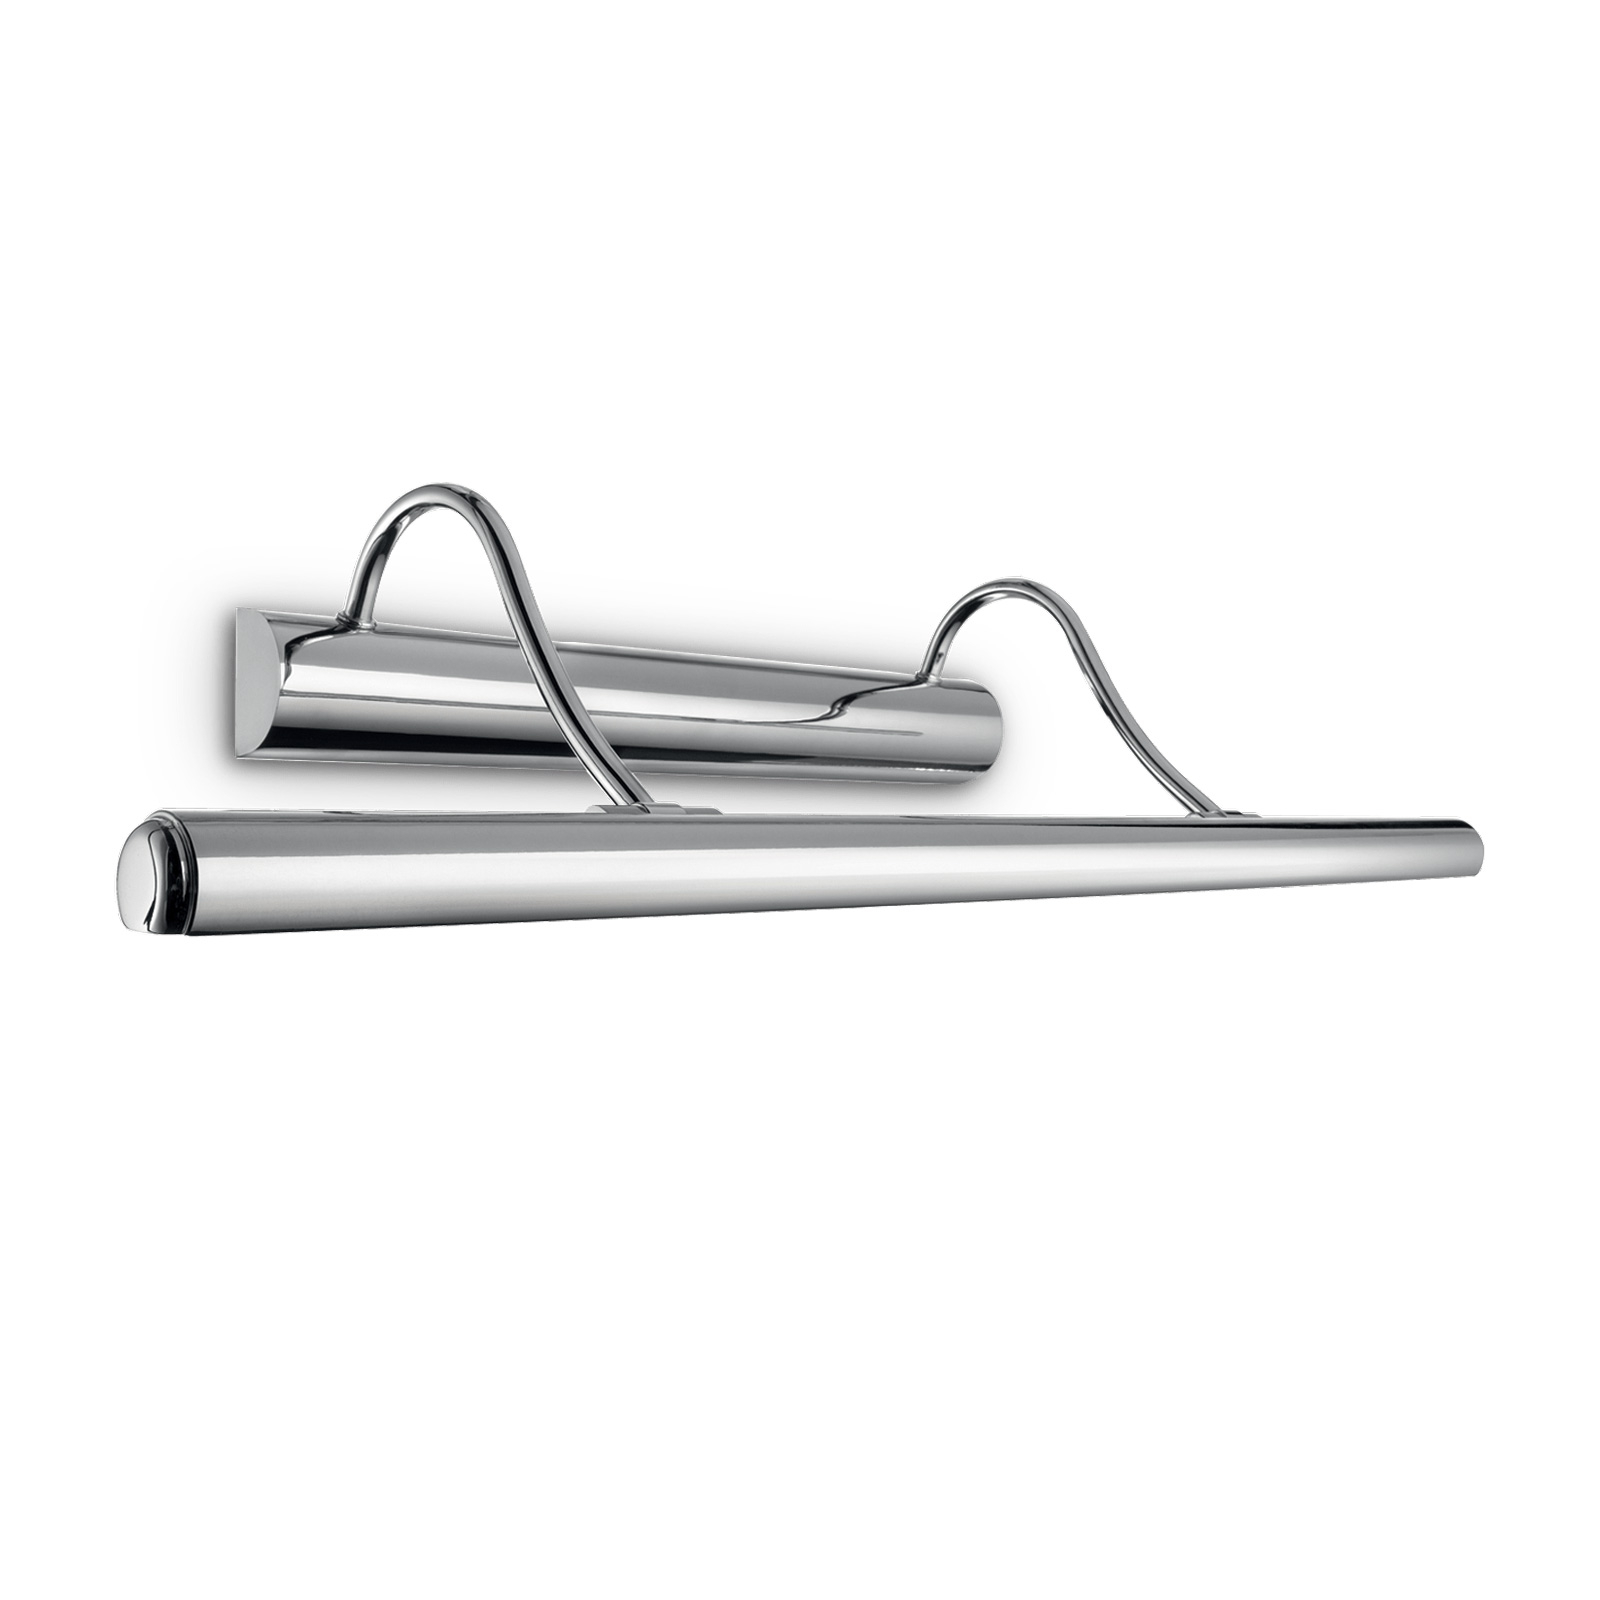 Vegglampe Mirror-10, krom, 60 cm